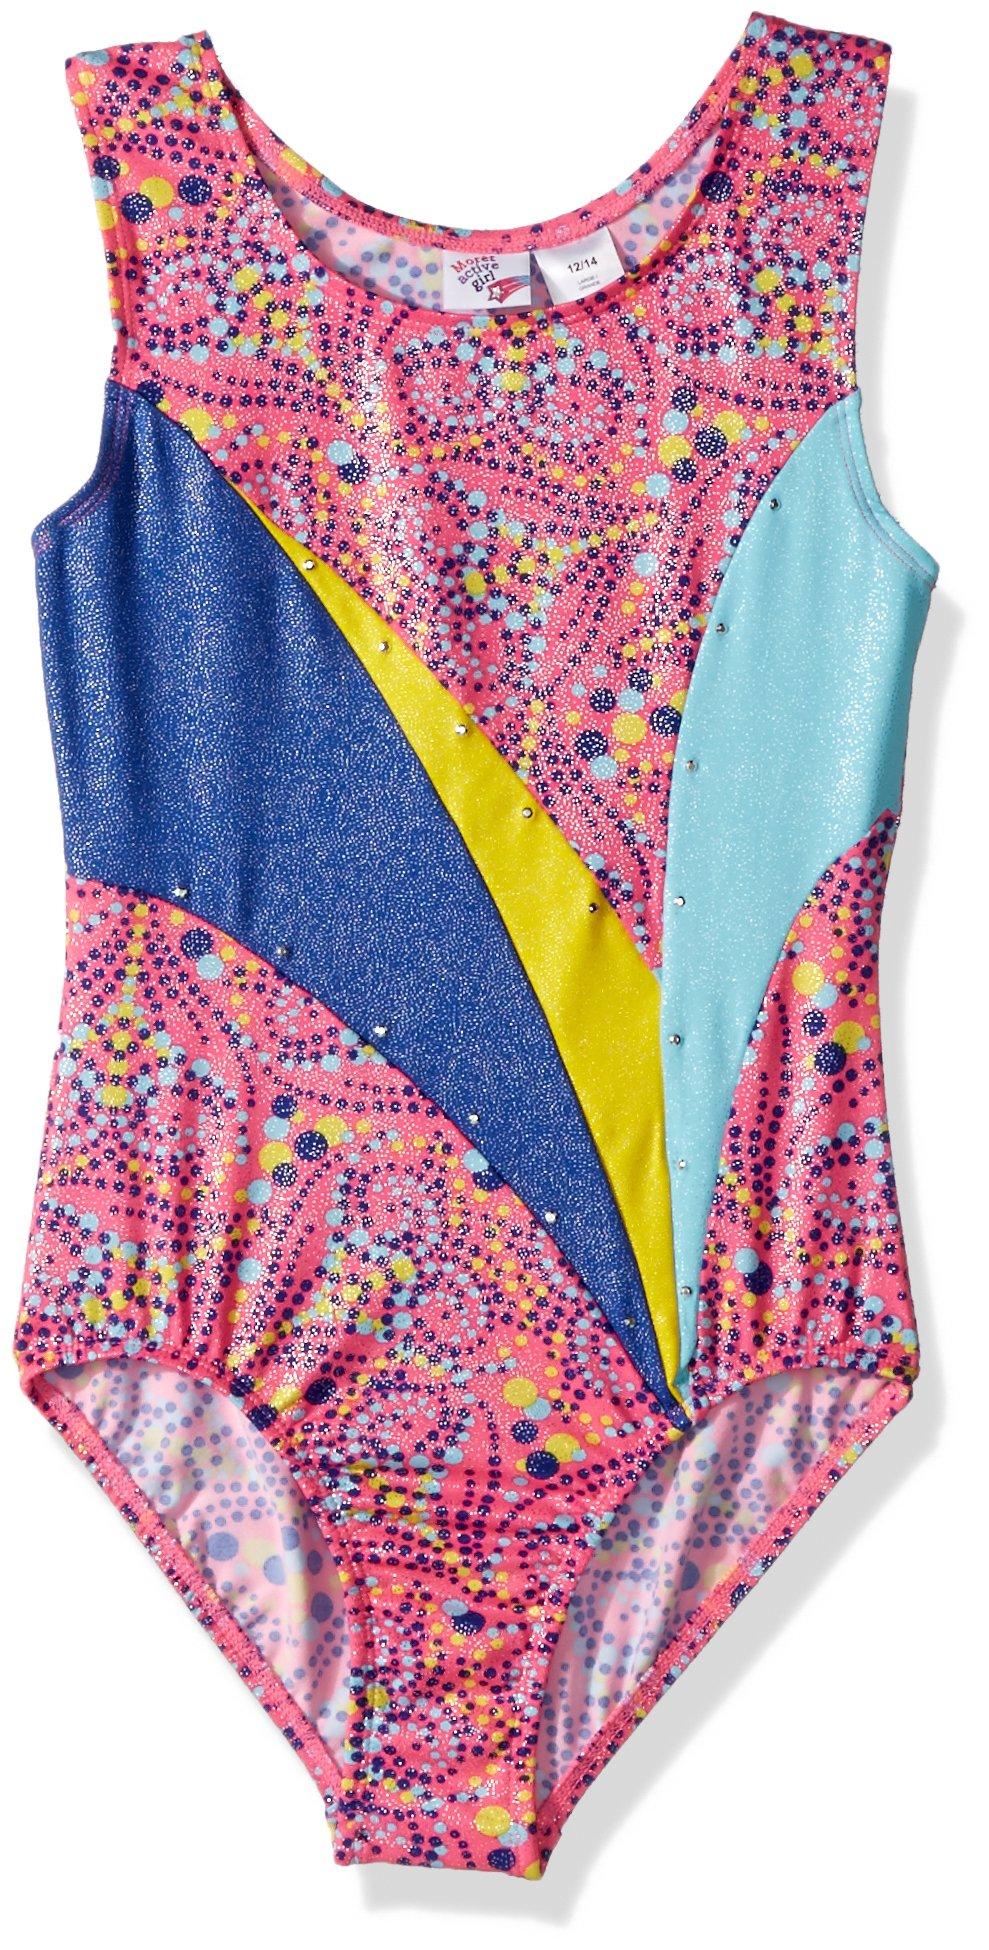 Jacques Moret Big Girls' Fun Gymnastics Leotard, Dotted Hearts Printed, Large